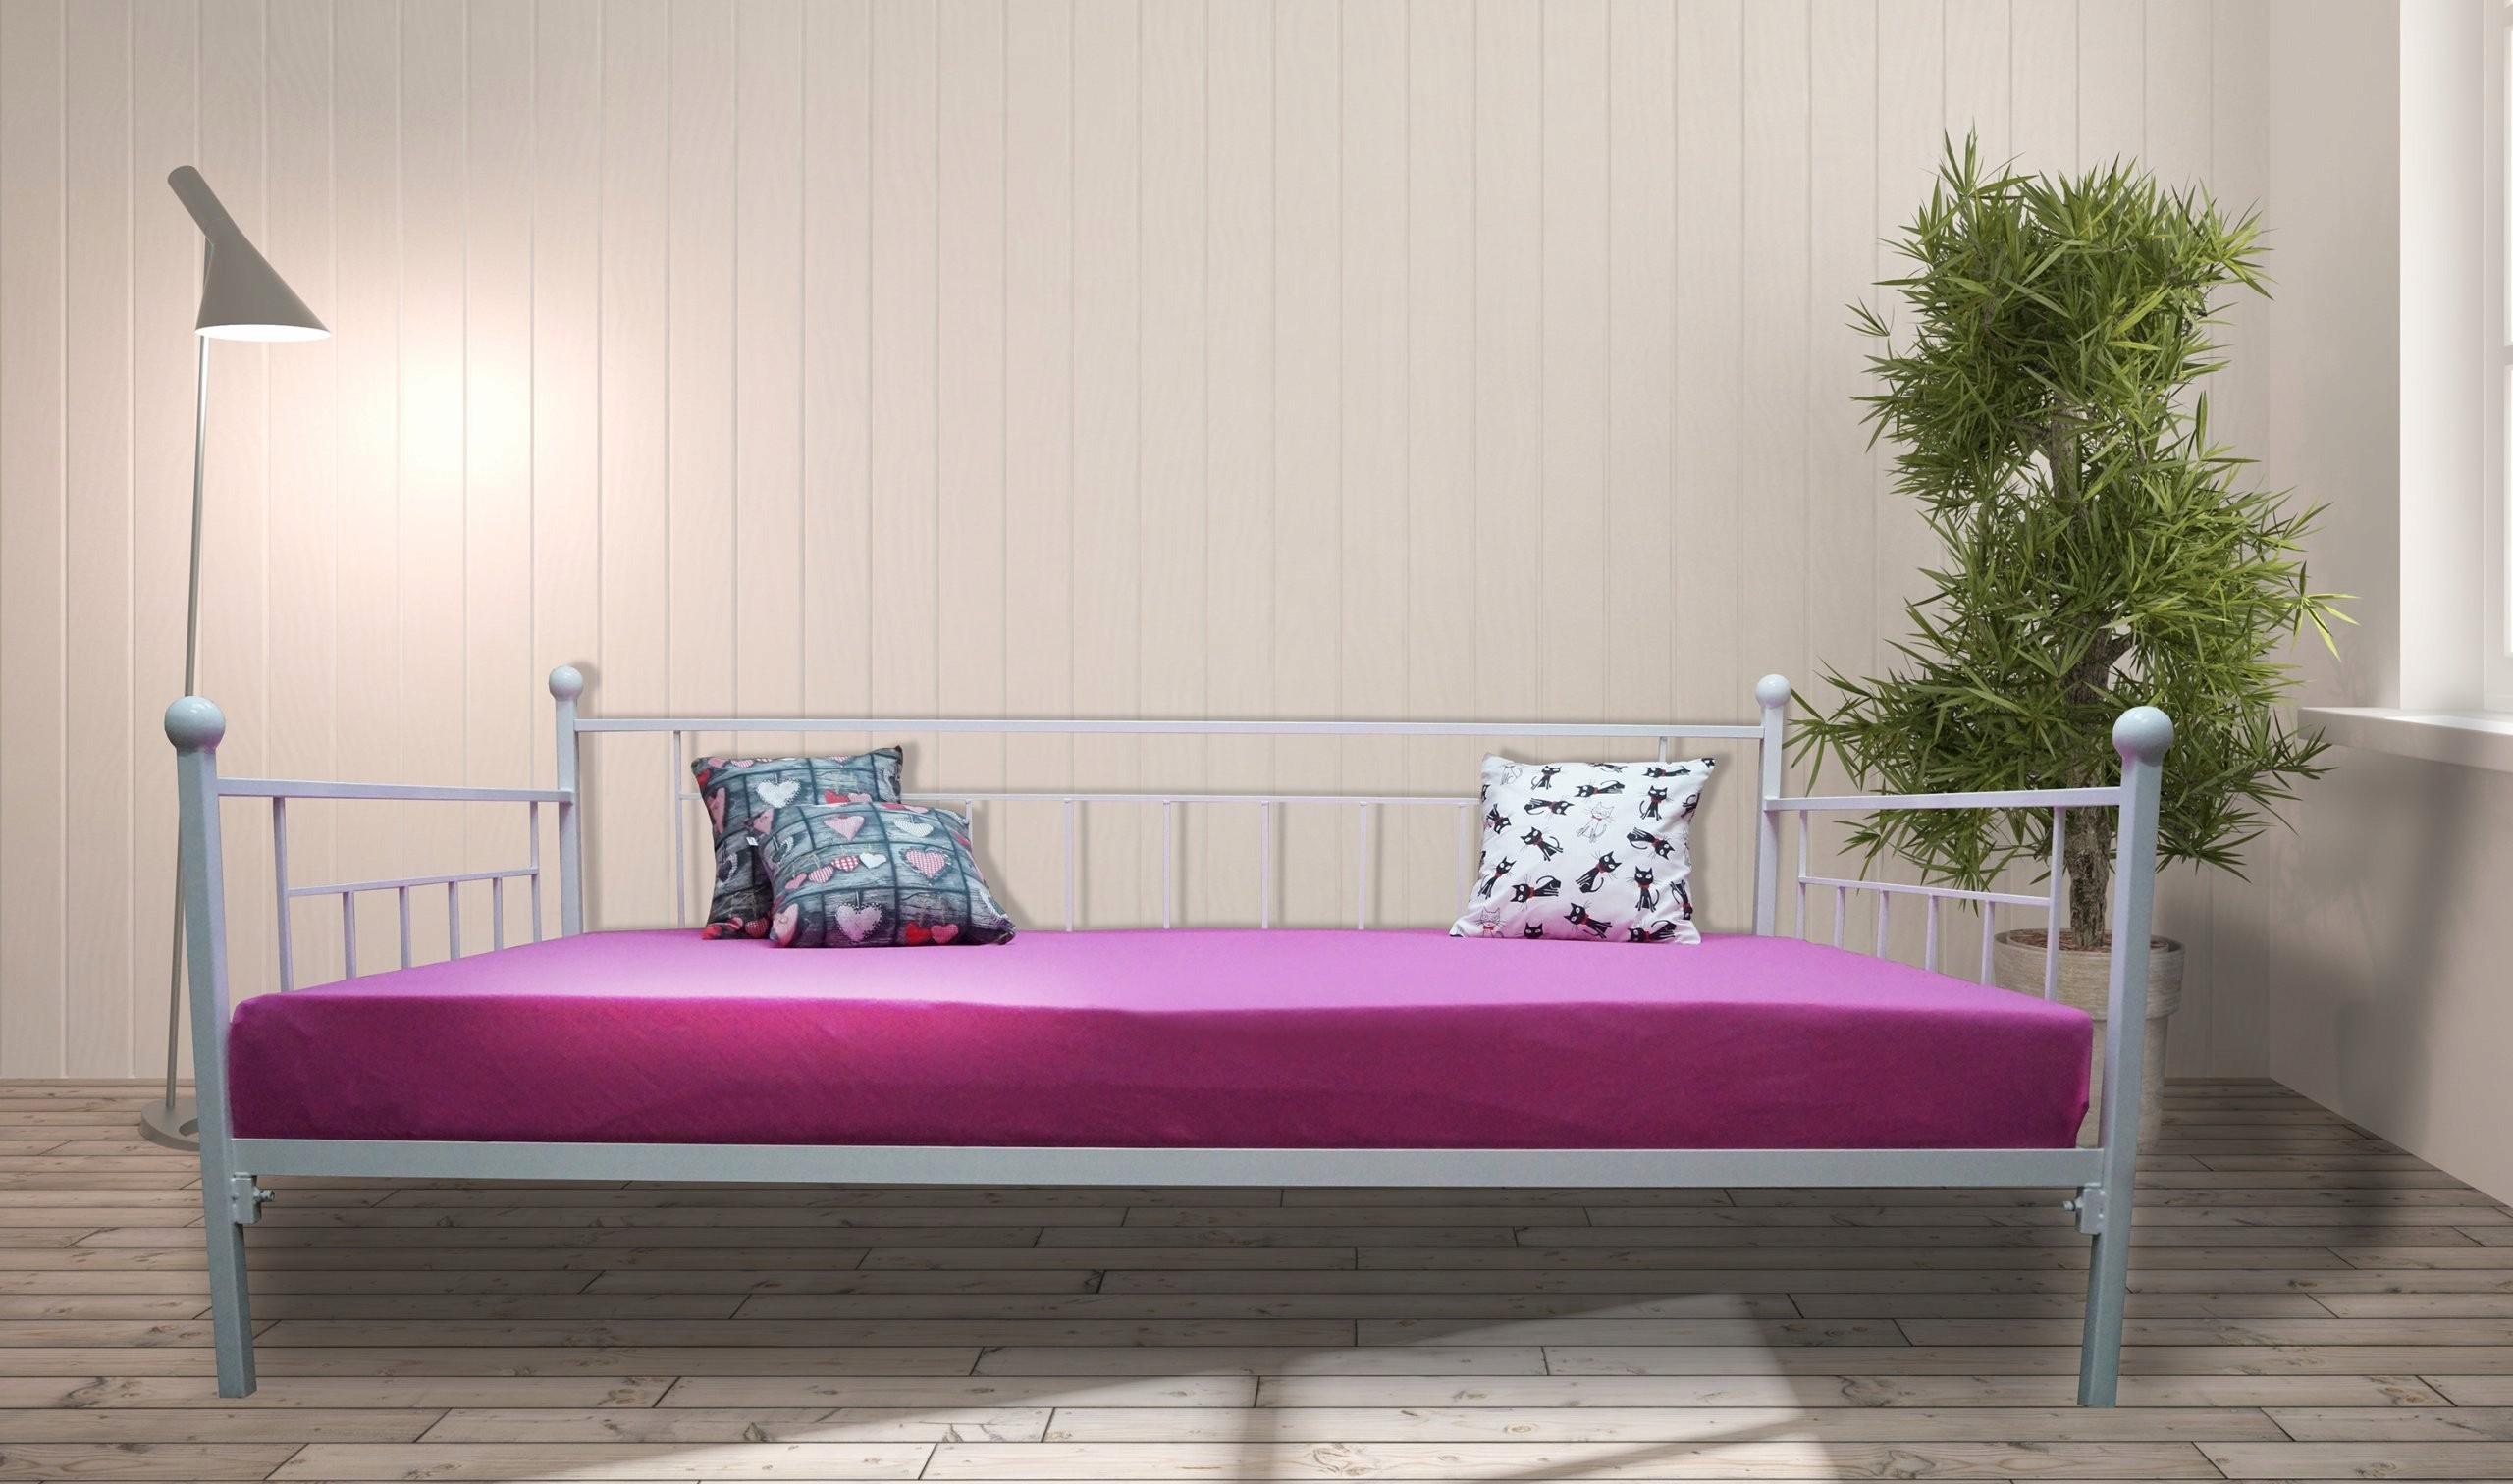 łóżko Metalowe Sofa Carmen 90x200 Kute 20 Kolorów